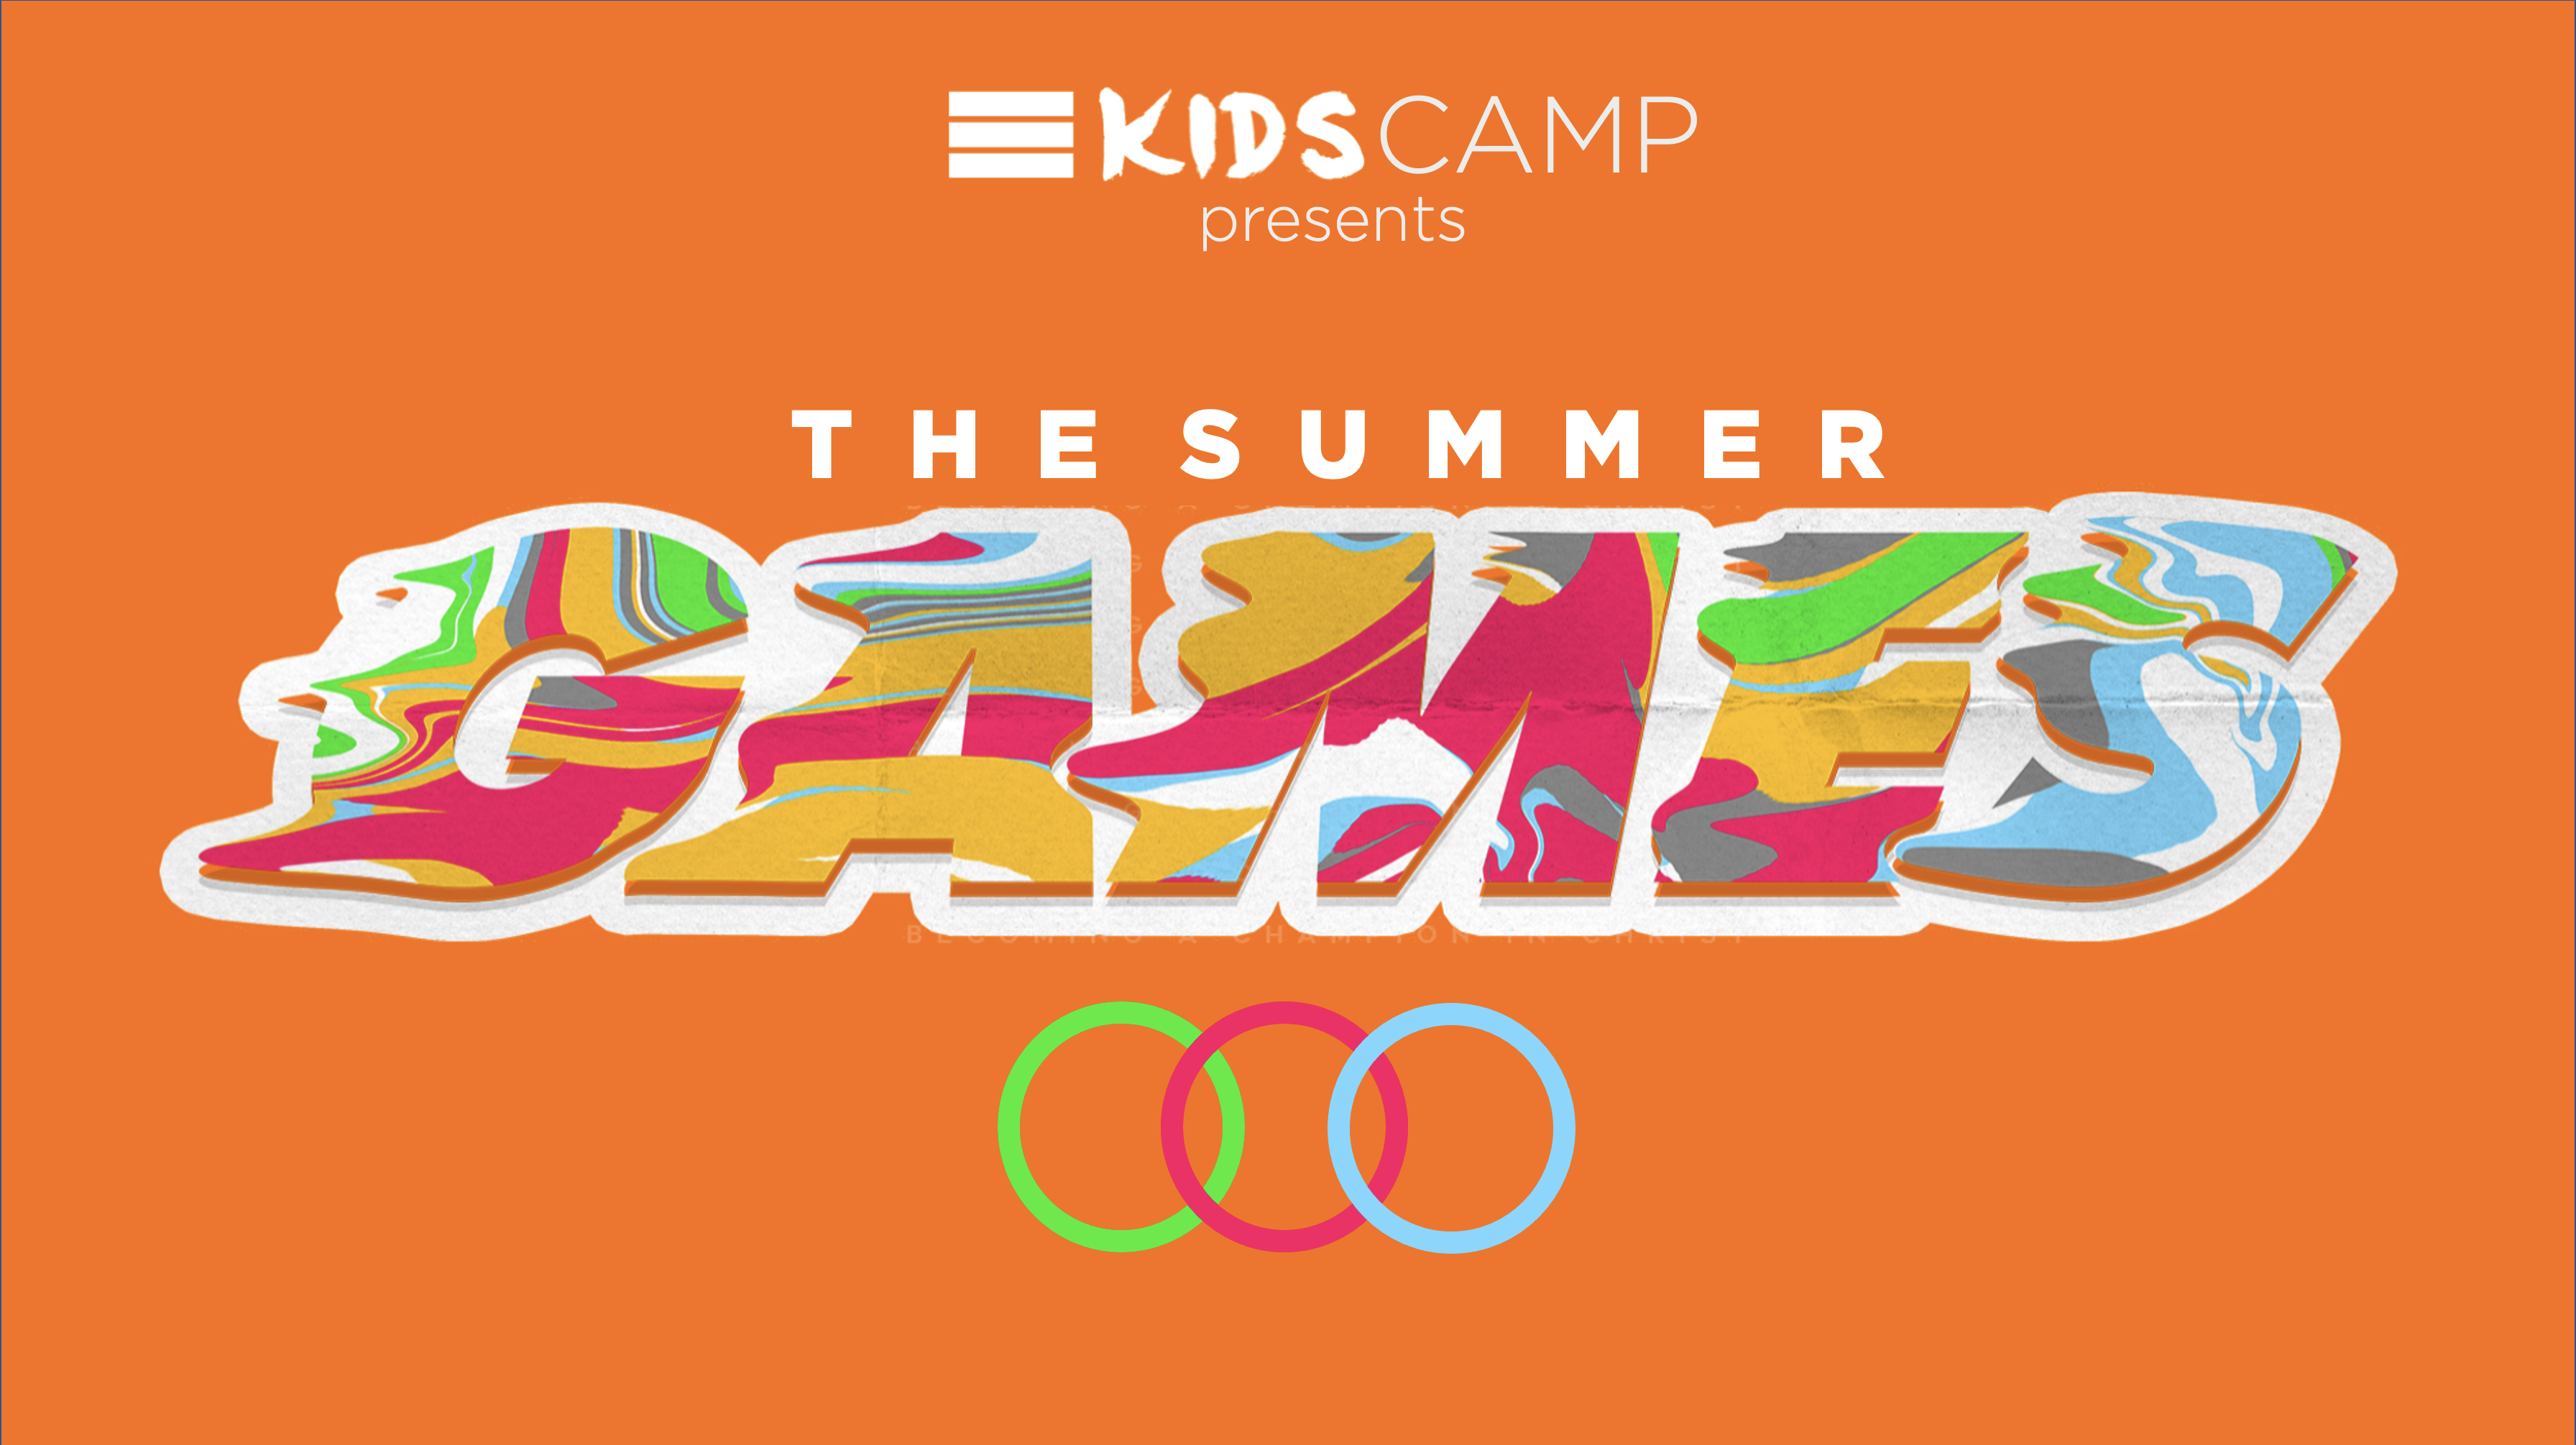 sck camp presents summer games logo 2